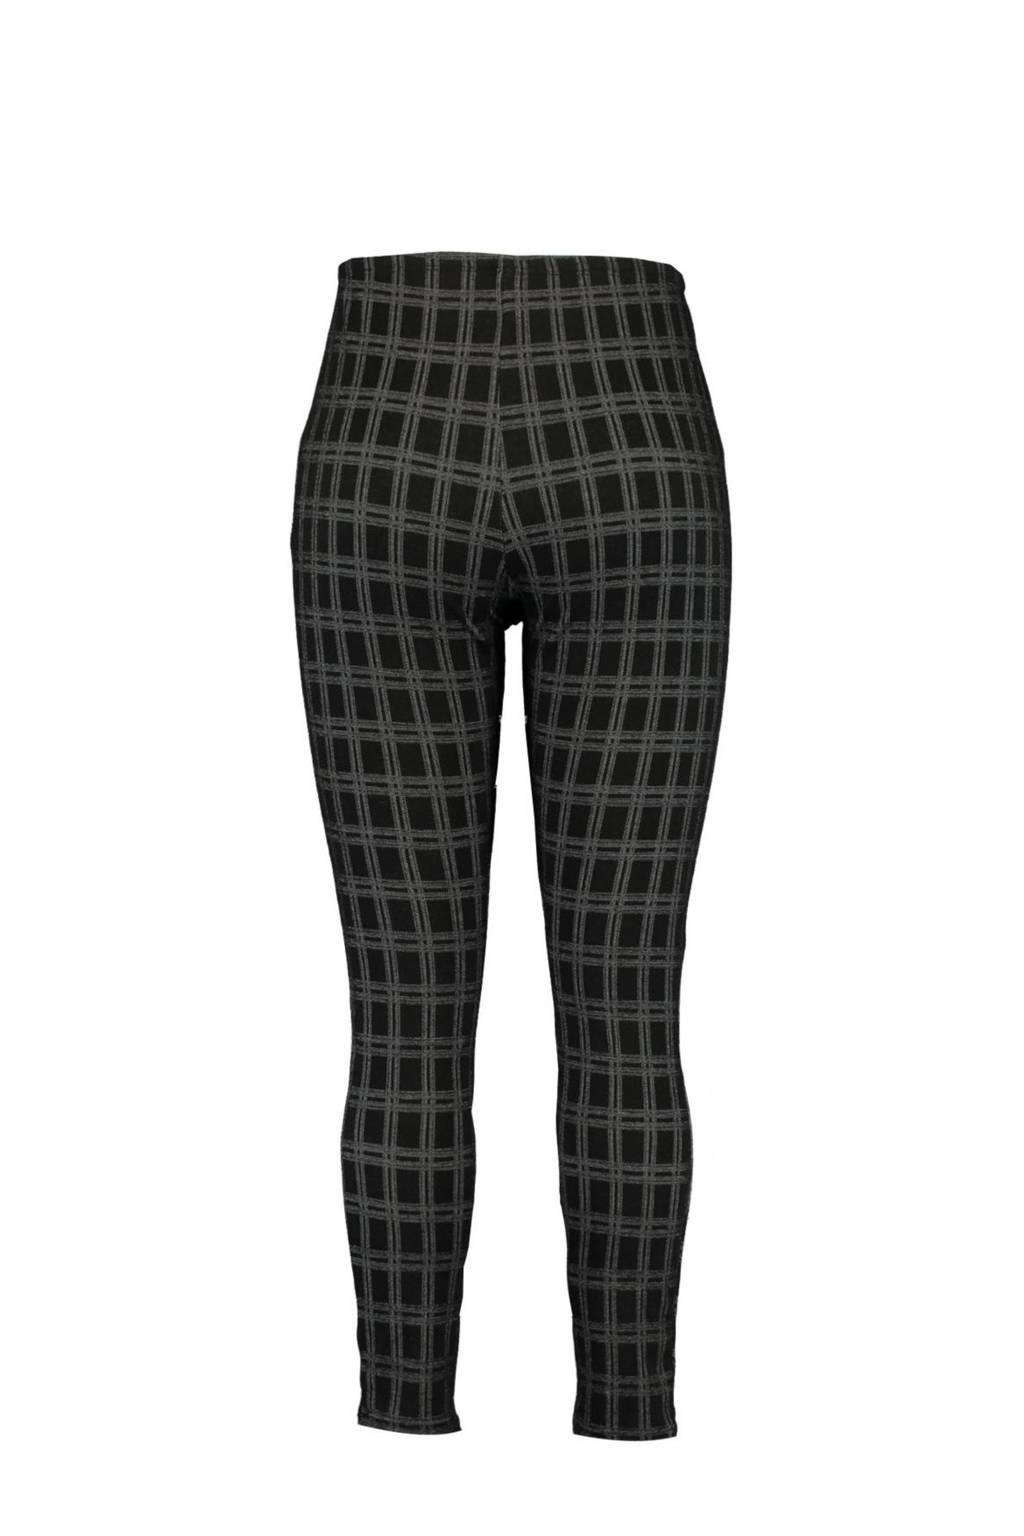 MS Mode geruite legging zwart/grijs, Zwart/grijs